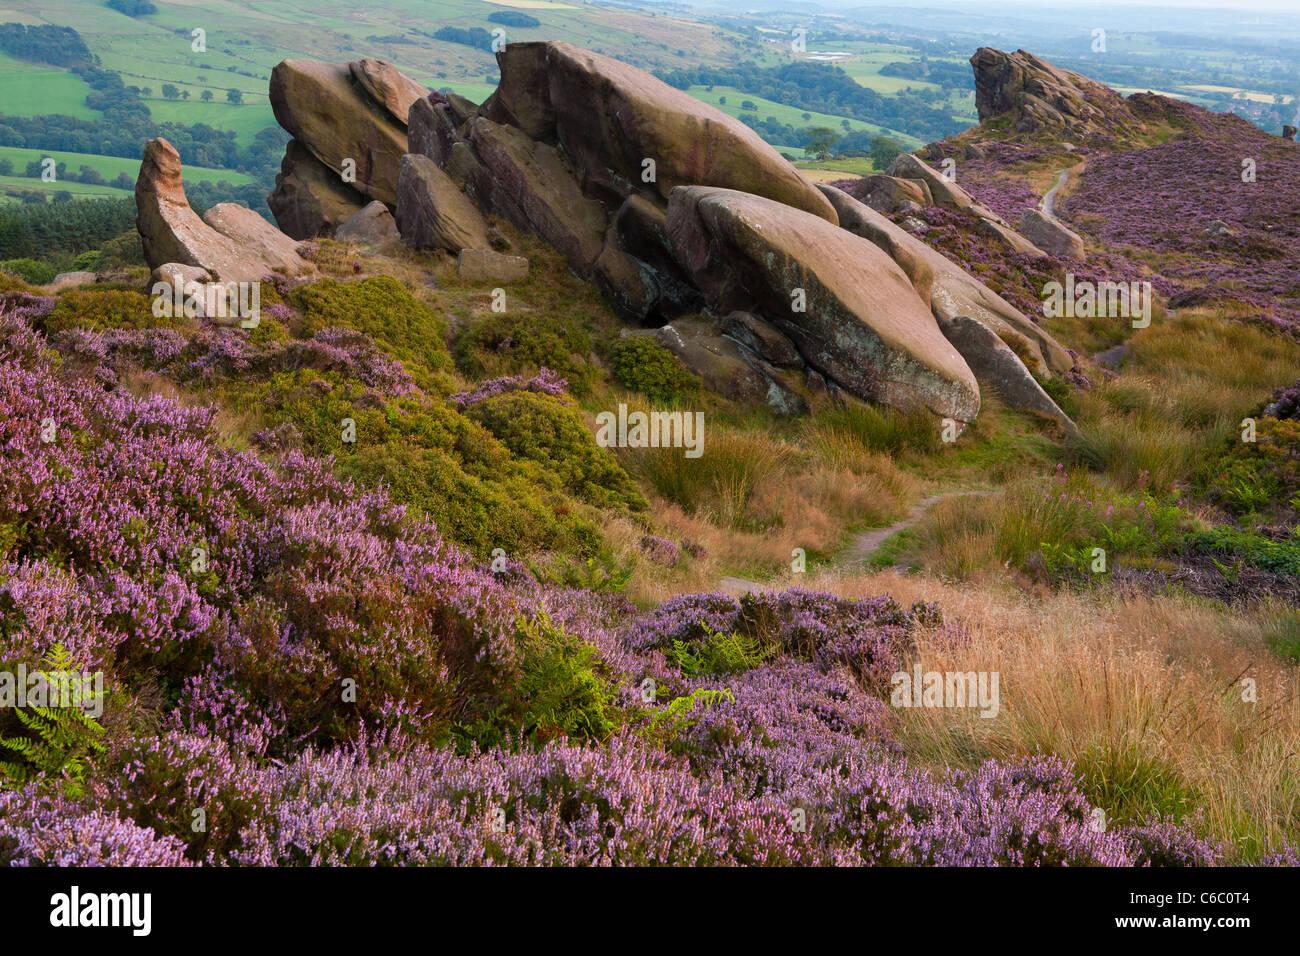 Ramshaw Rocks, near Leek, Staffordshire Moorlands, Peak District National Park - Stock Image